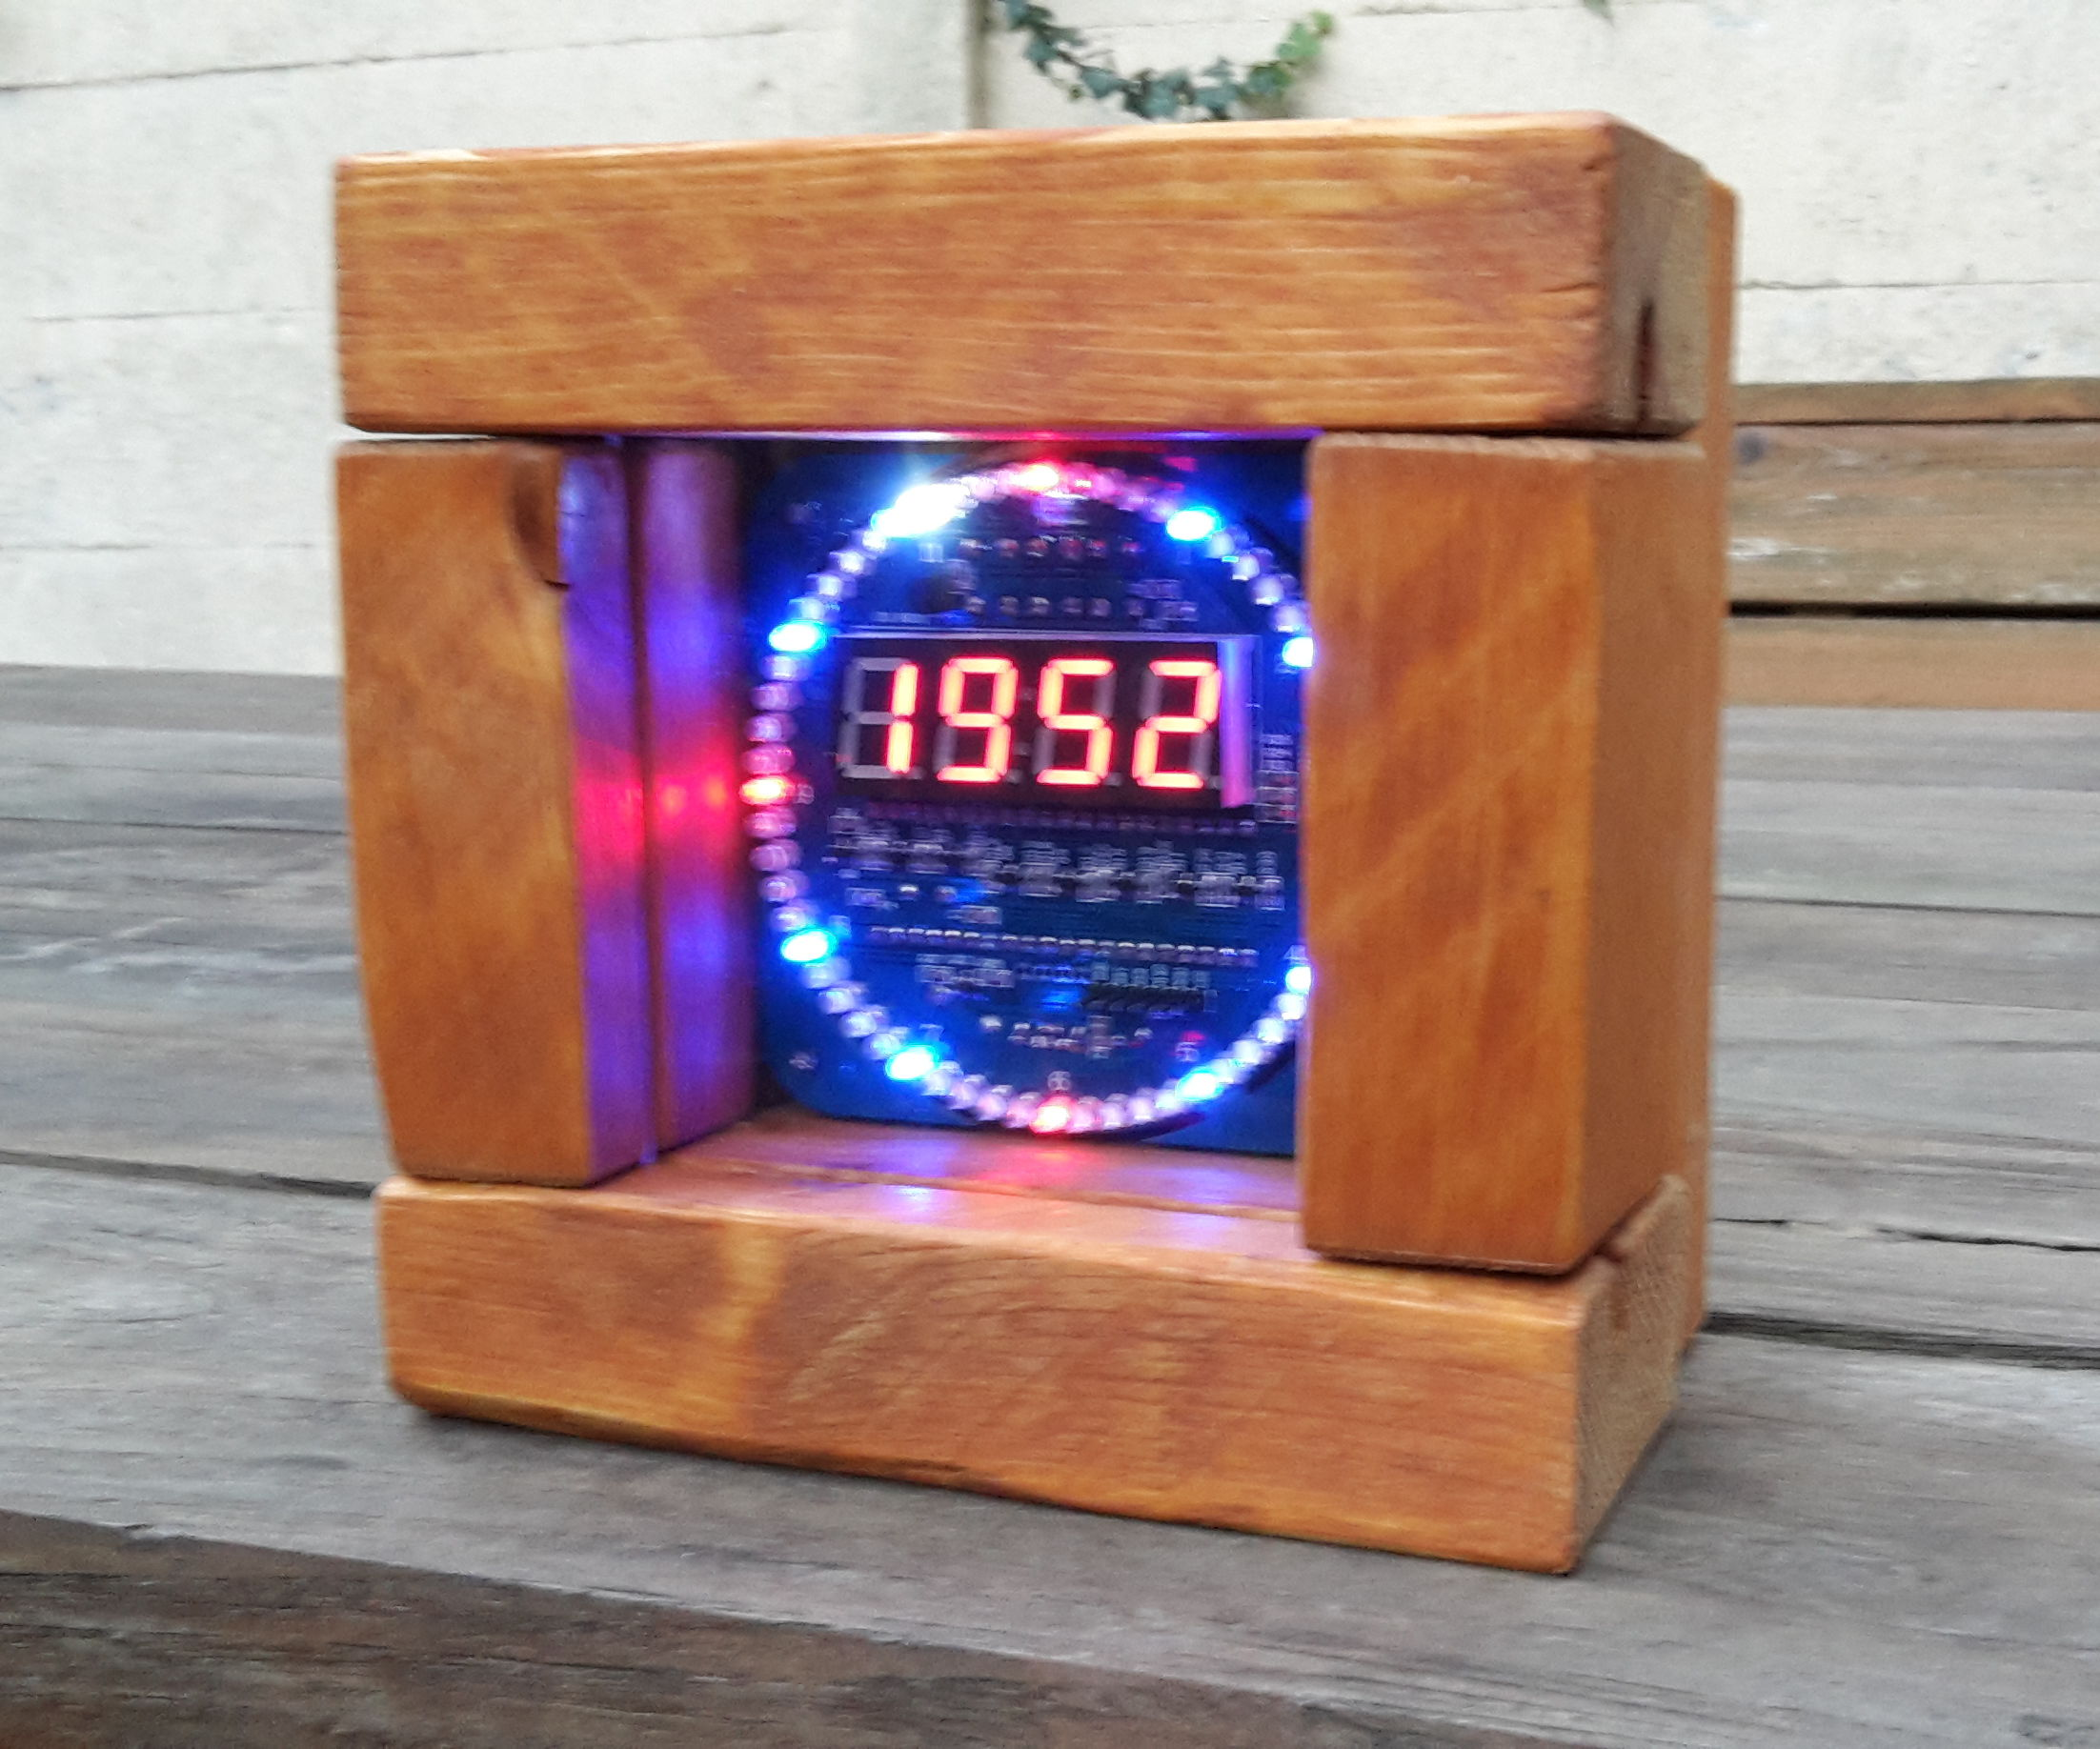 Custom wooden case for DIY Ebay DS1302 rotating clock